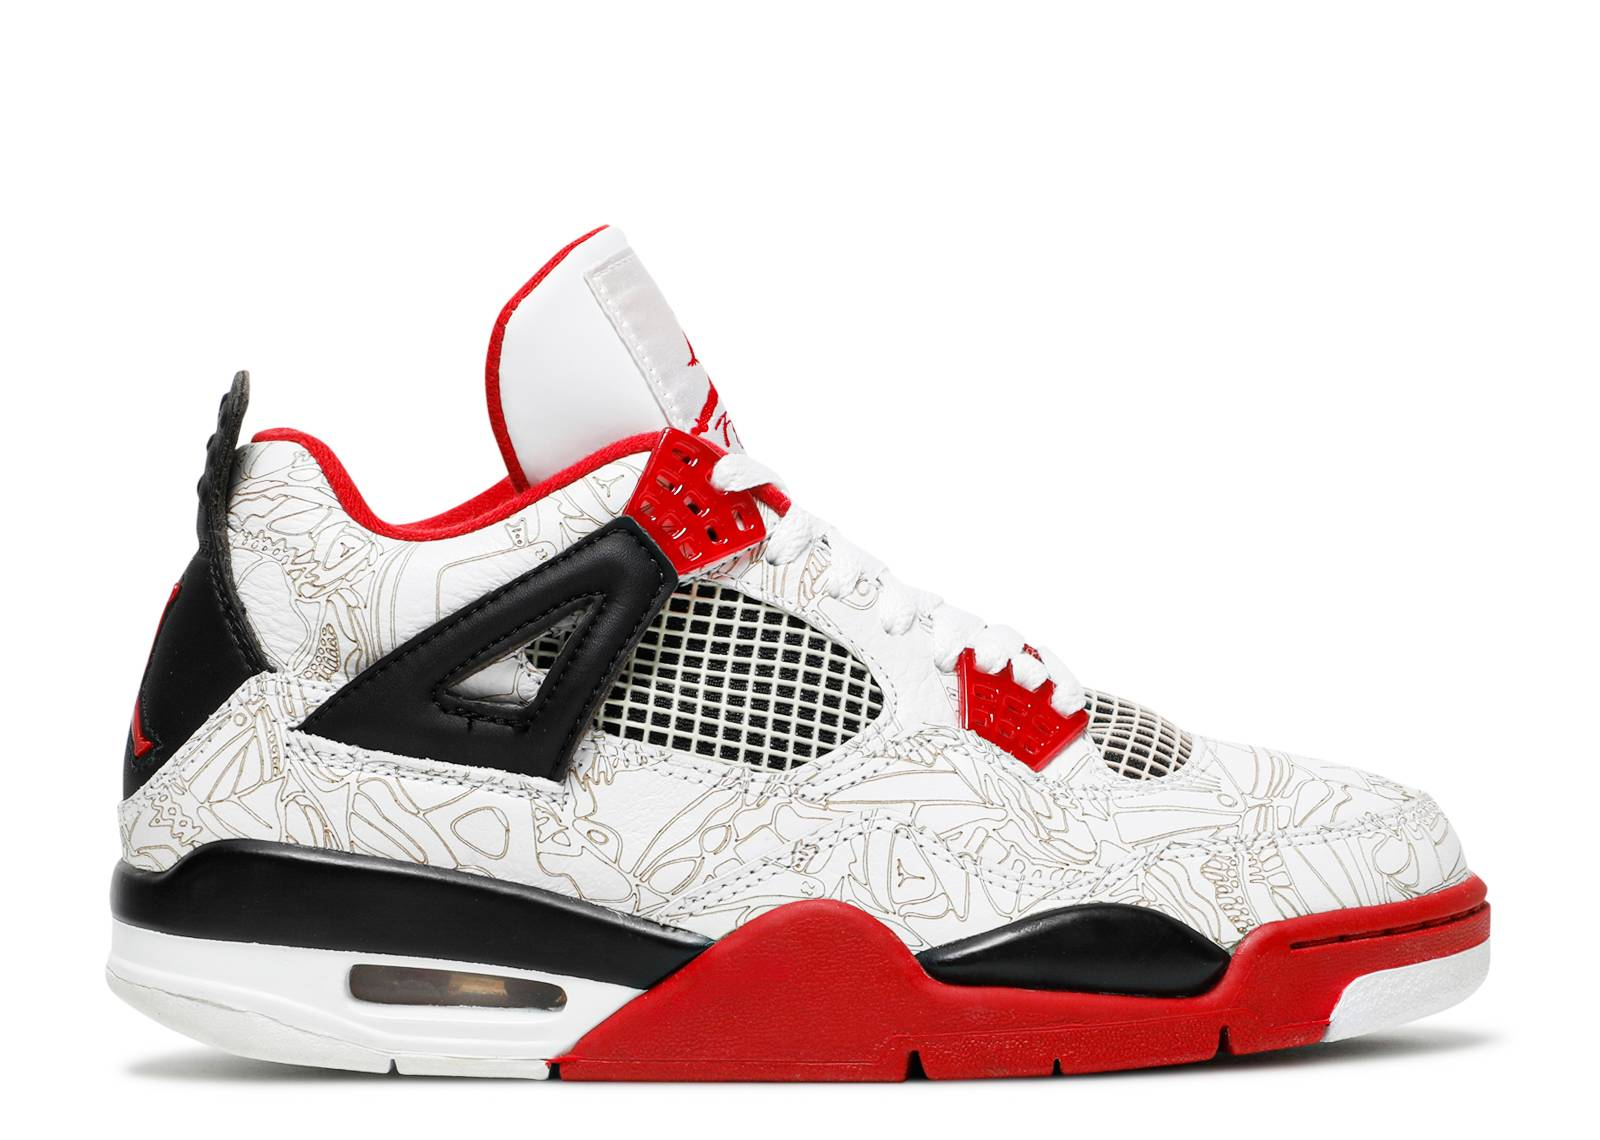 Air Jordan 4 winkel